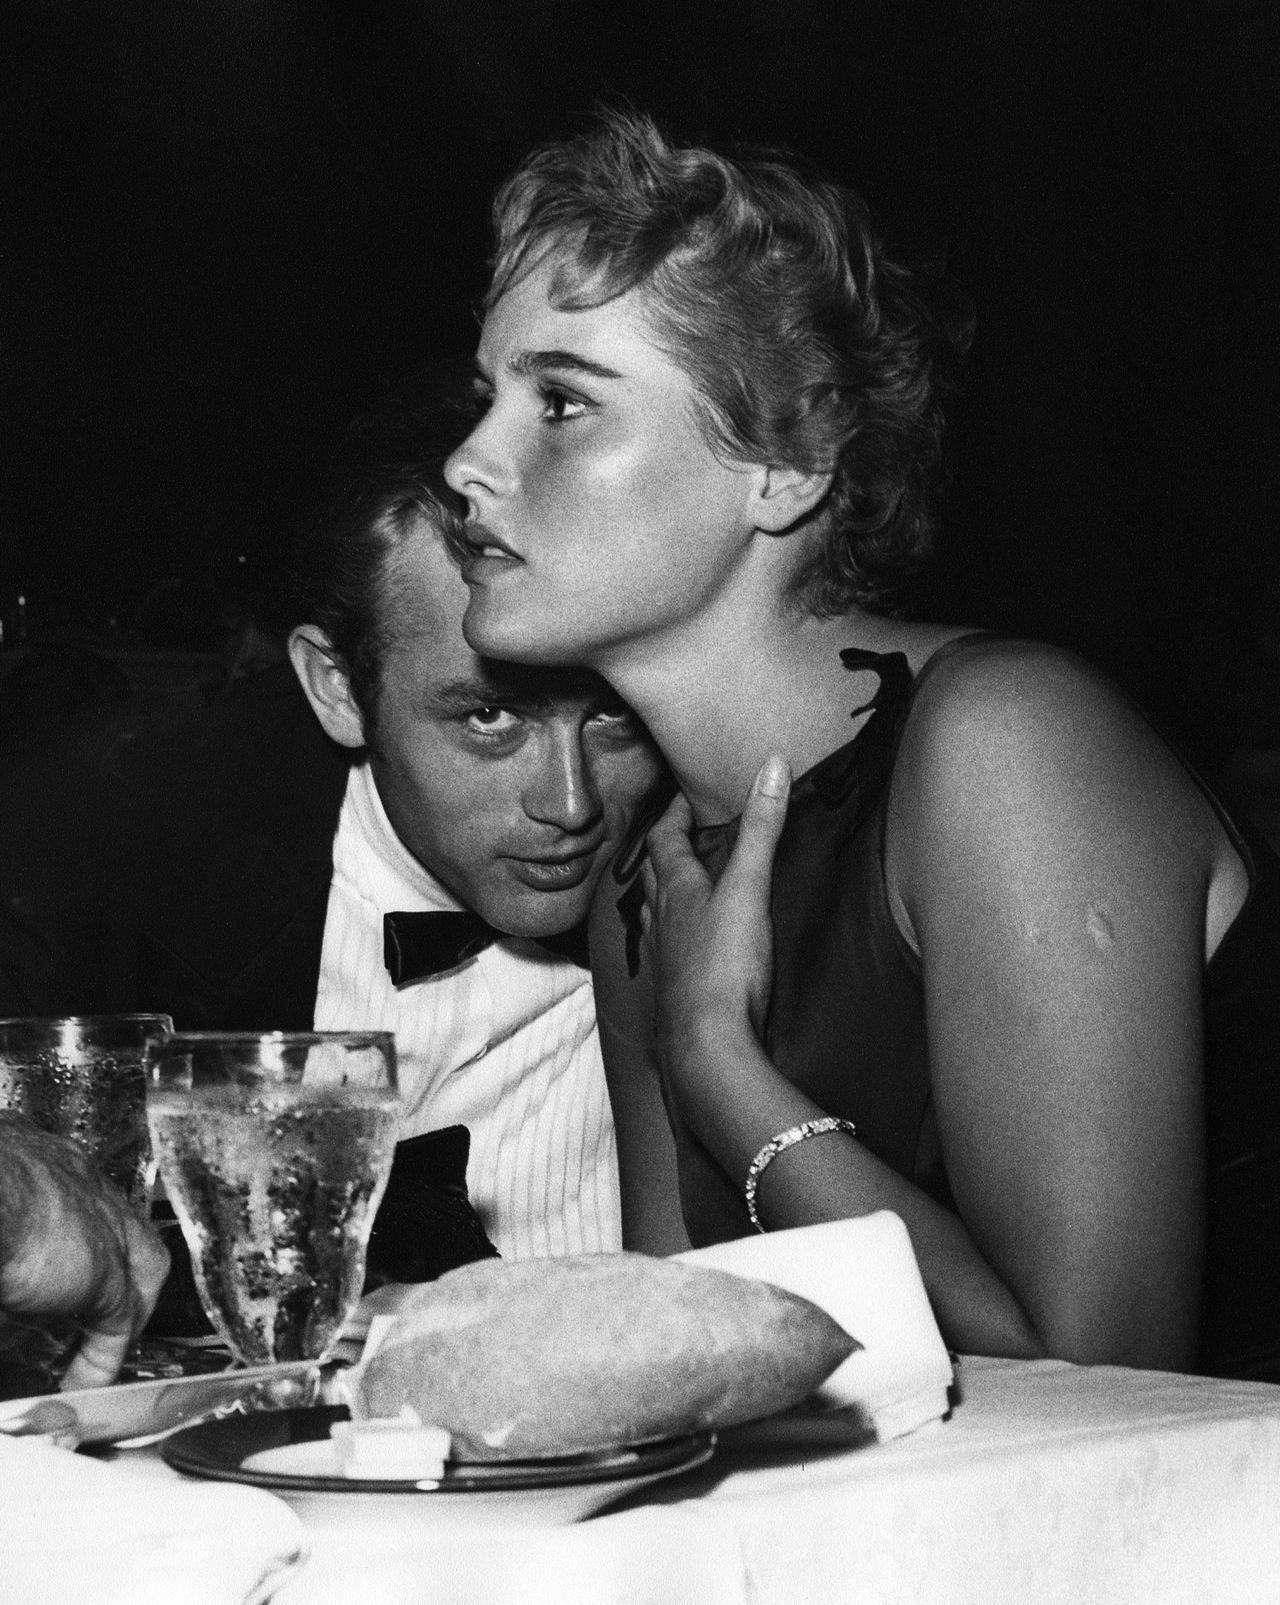 c4a4154496b9 James Dean with Ursula Andress at Ciro s (1955)